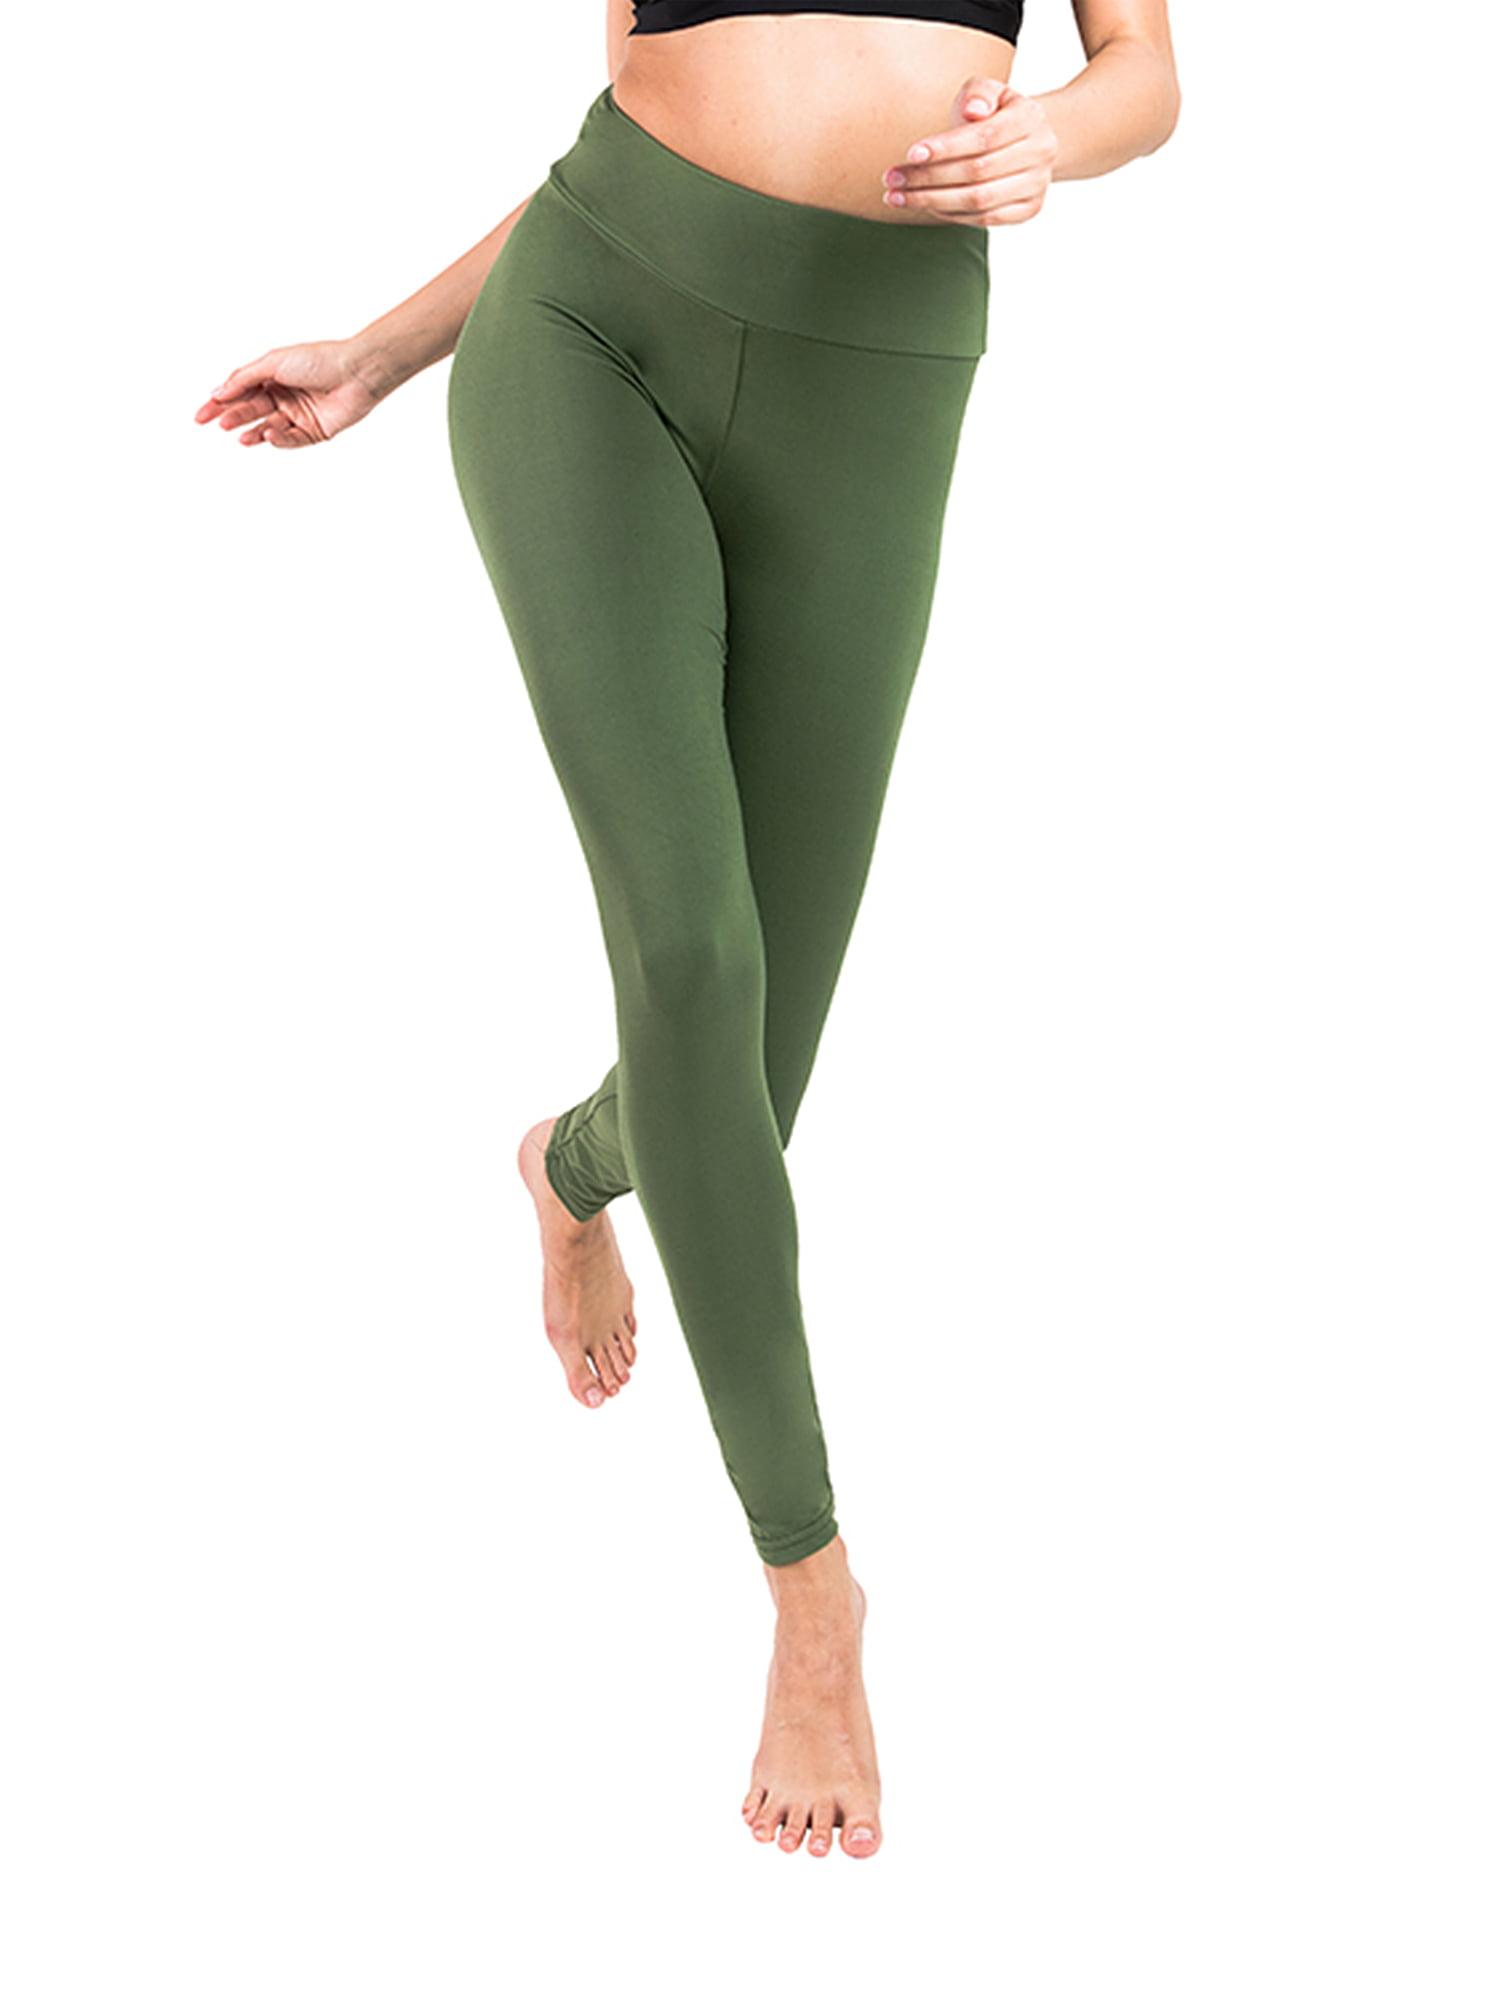 Women Sports Pants High Waist Yoga Running Workout Gym Capri Trousers Stretch